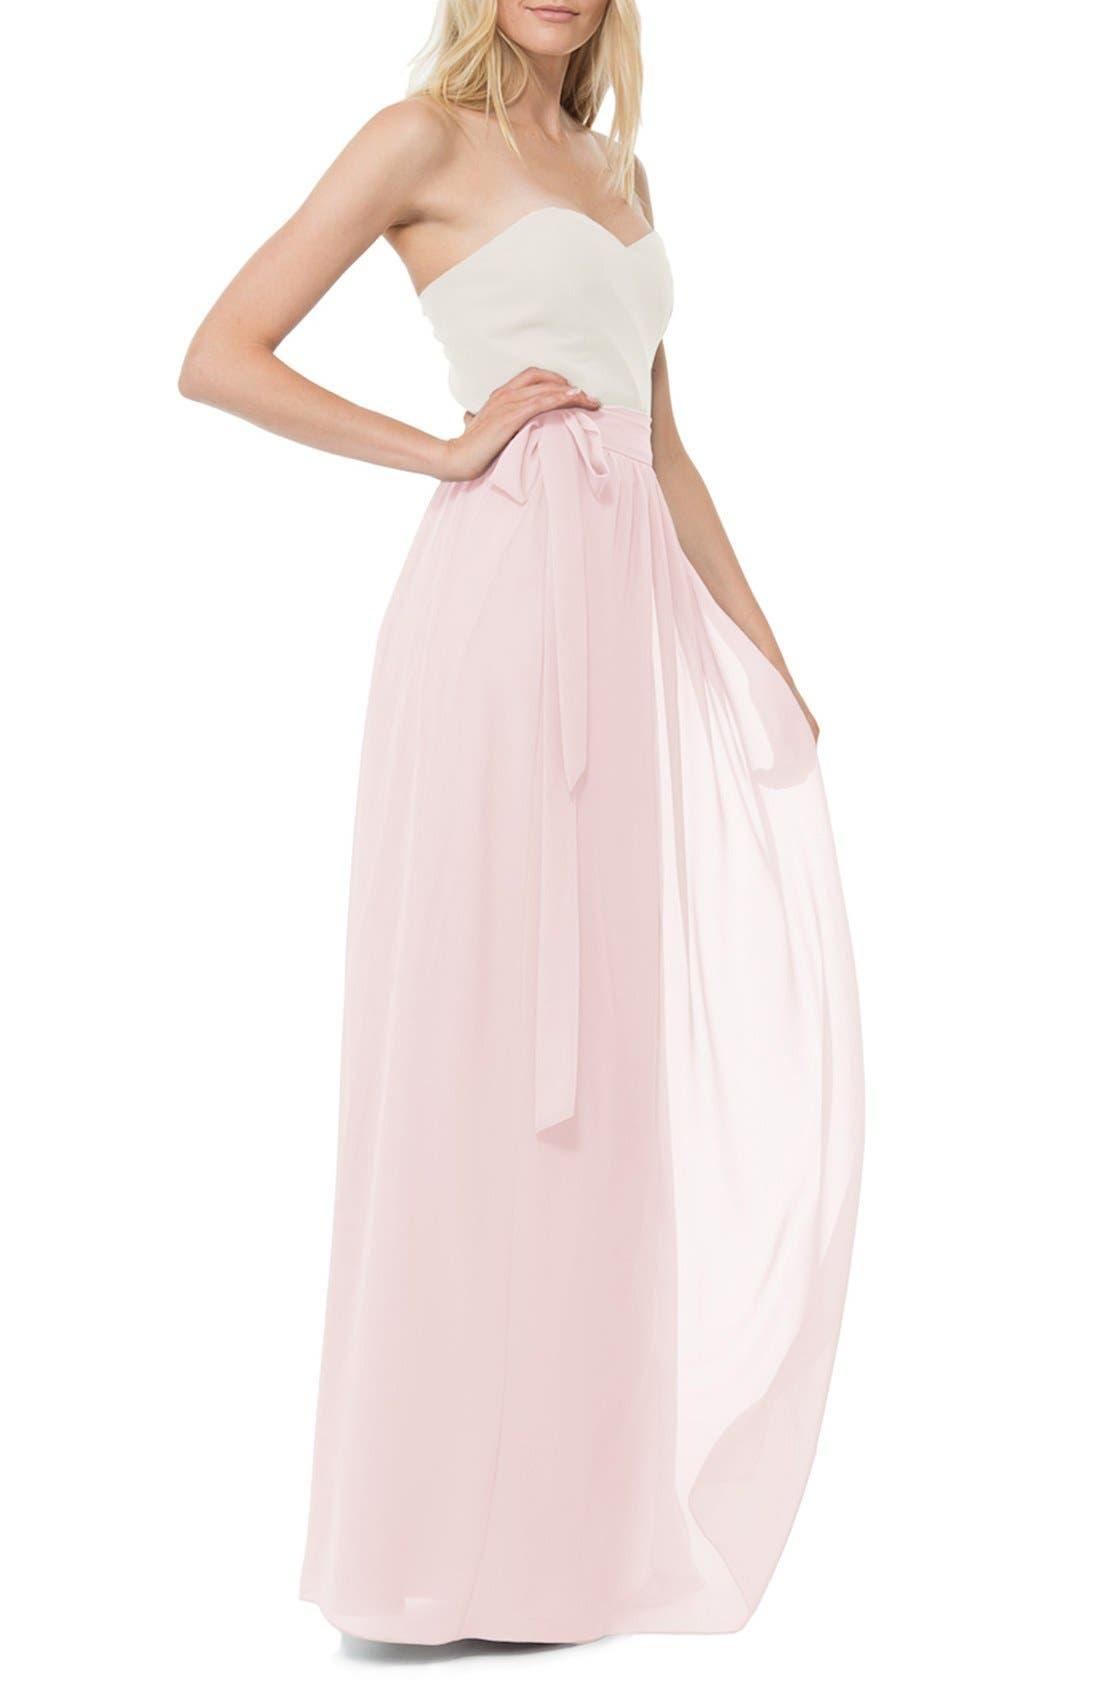 CEREMONY BY JOANNA AUGUST Whitney Chiffon Wrap Maxi Skirt